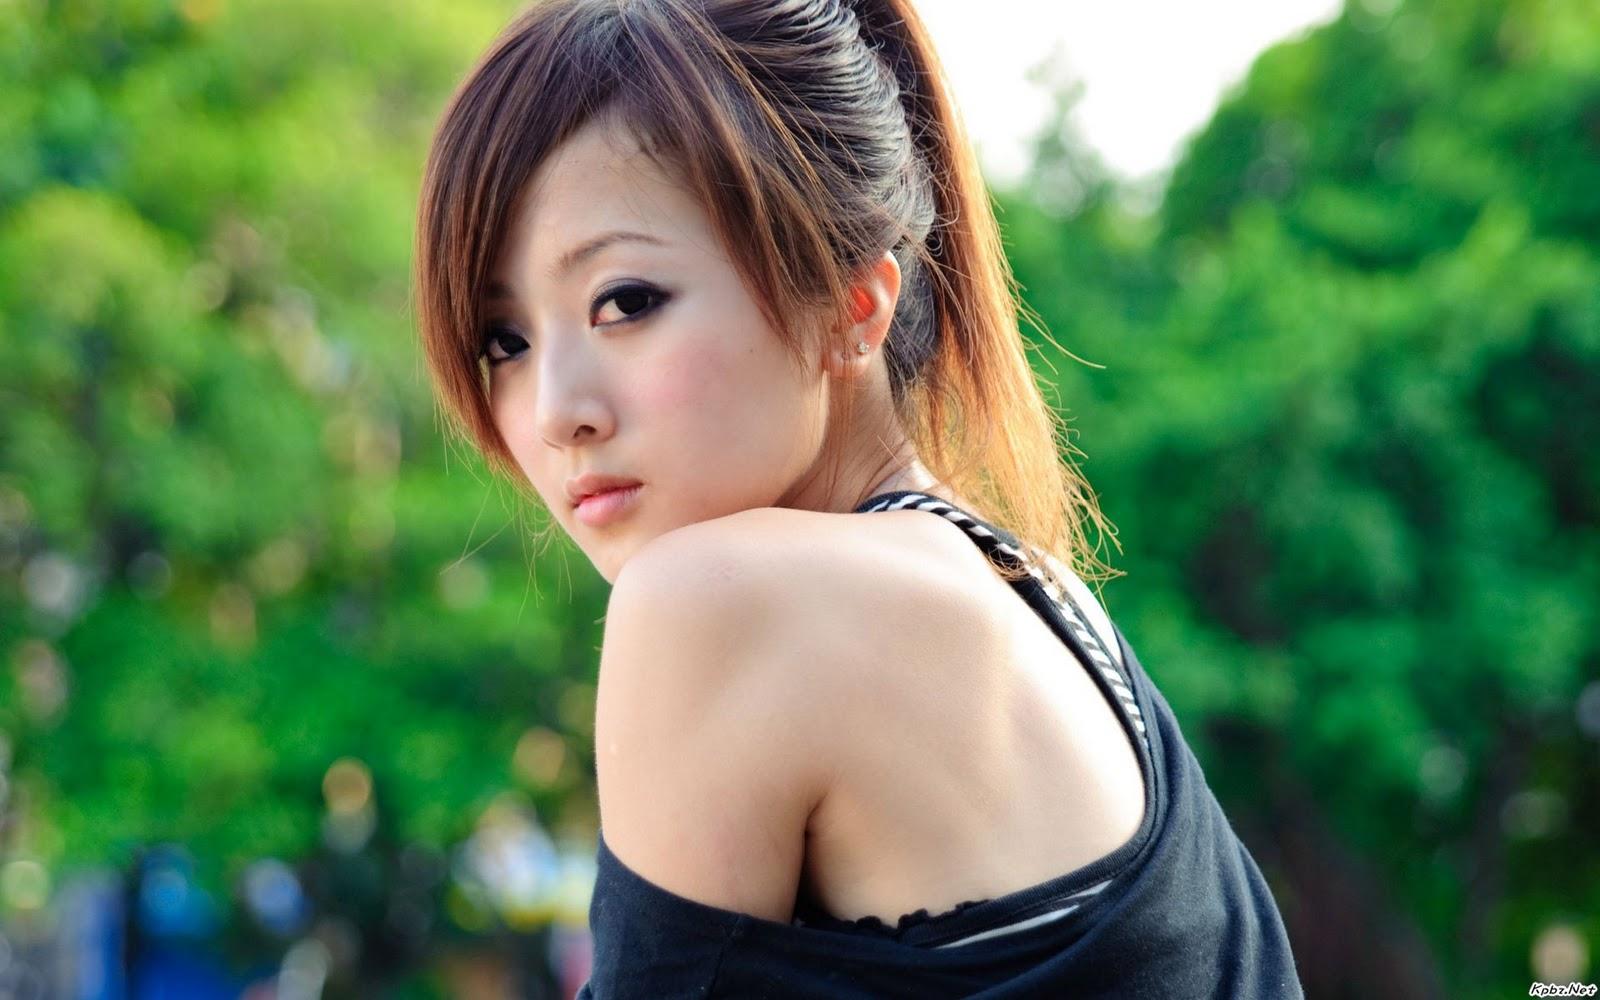 HD Asian Girls Pics, Live Asian Girls Wallpapers (ONB896+ WP)